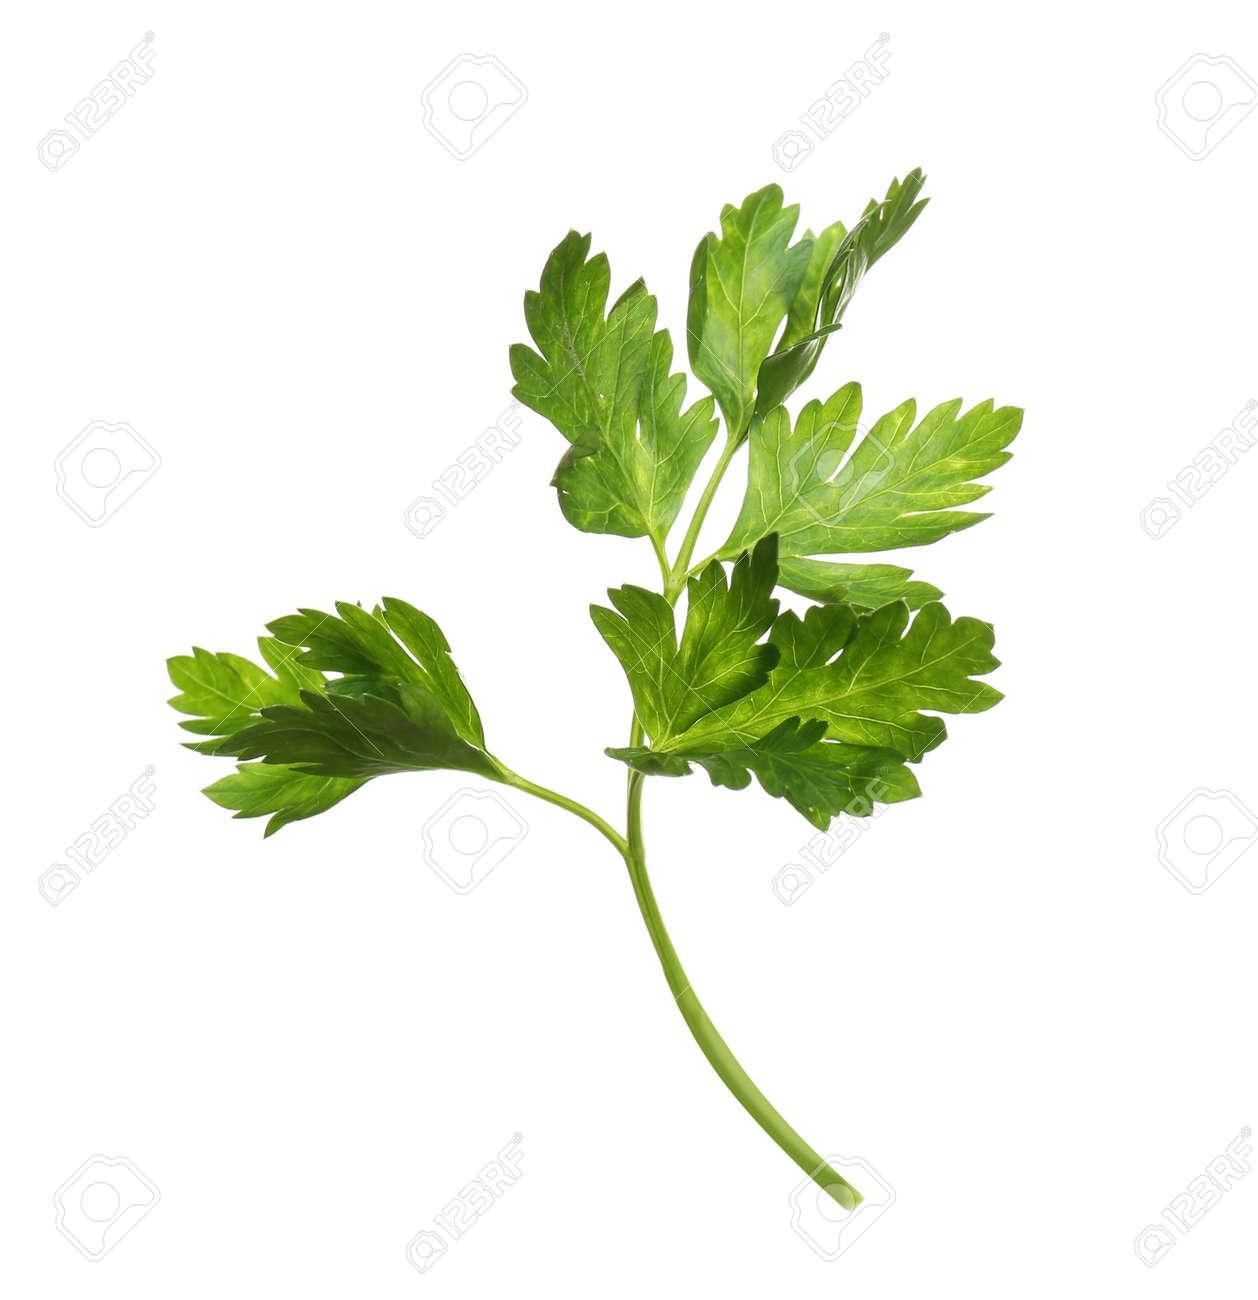 Fresh green organic parsley on white background - 125039797